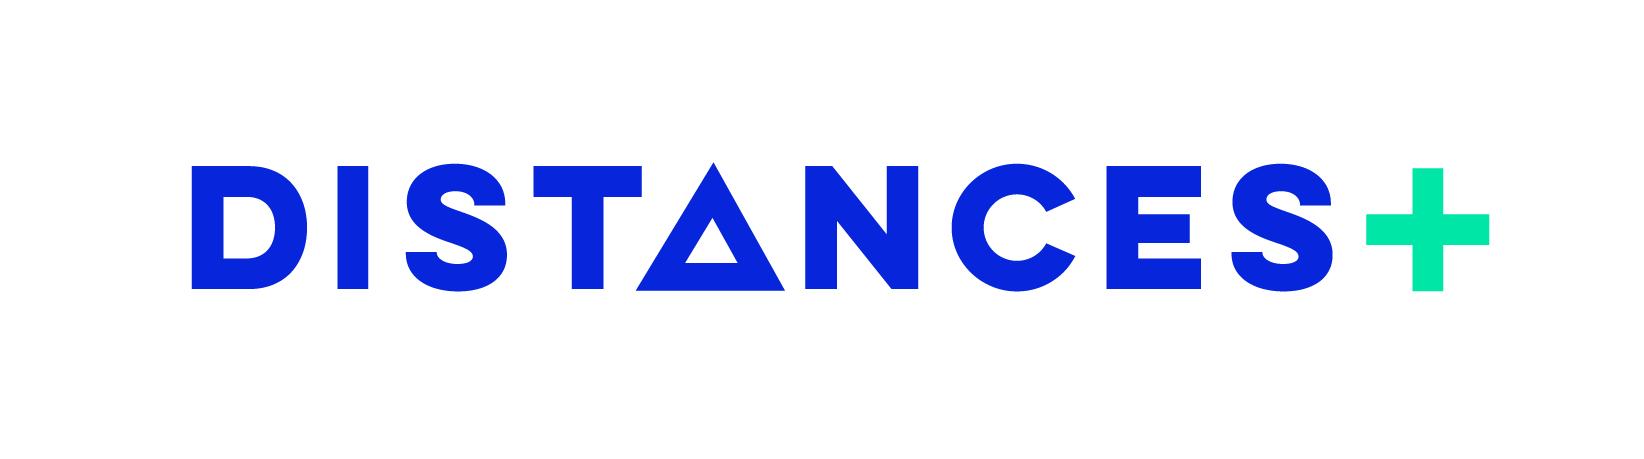 Logo_Distances+150dpi.png